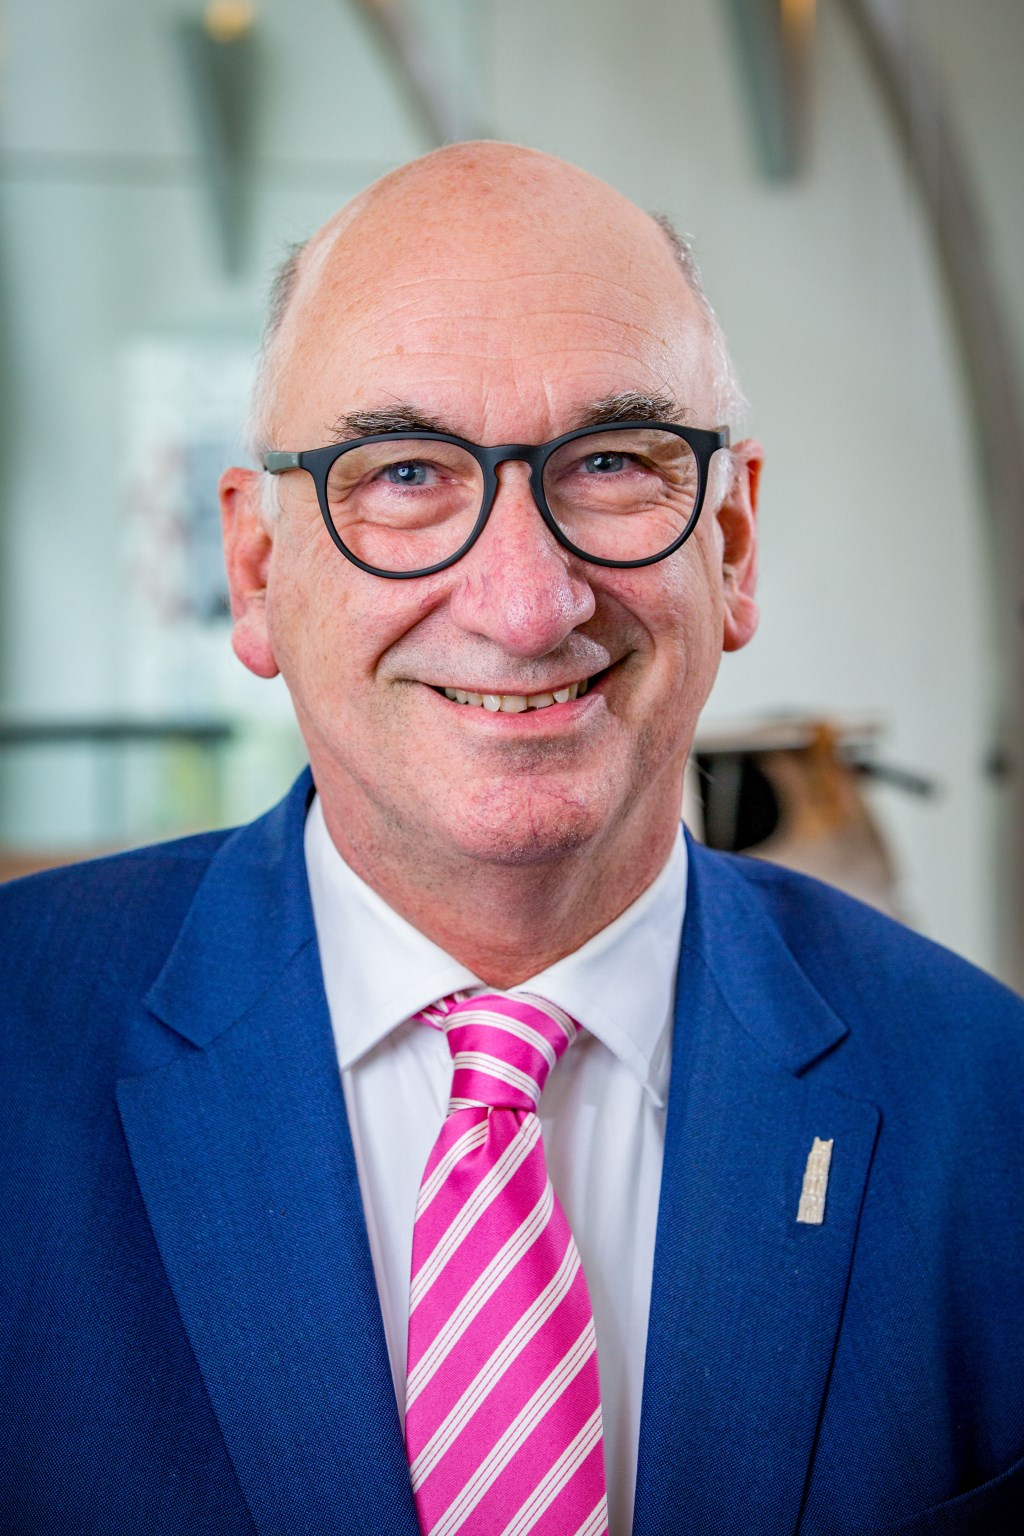 Albert van den Bosch is enthousiast ambassadeur van de Matthäus Foto: Gemeente Zaltbommel/Stichting Matthäus © Persgroep